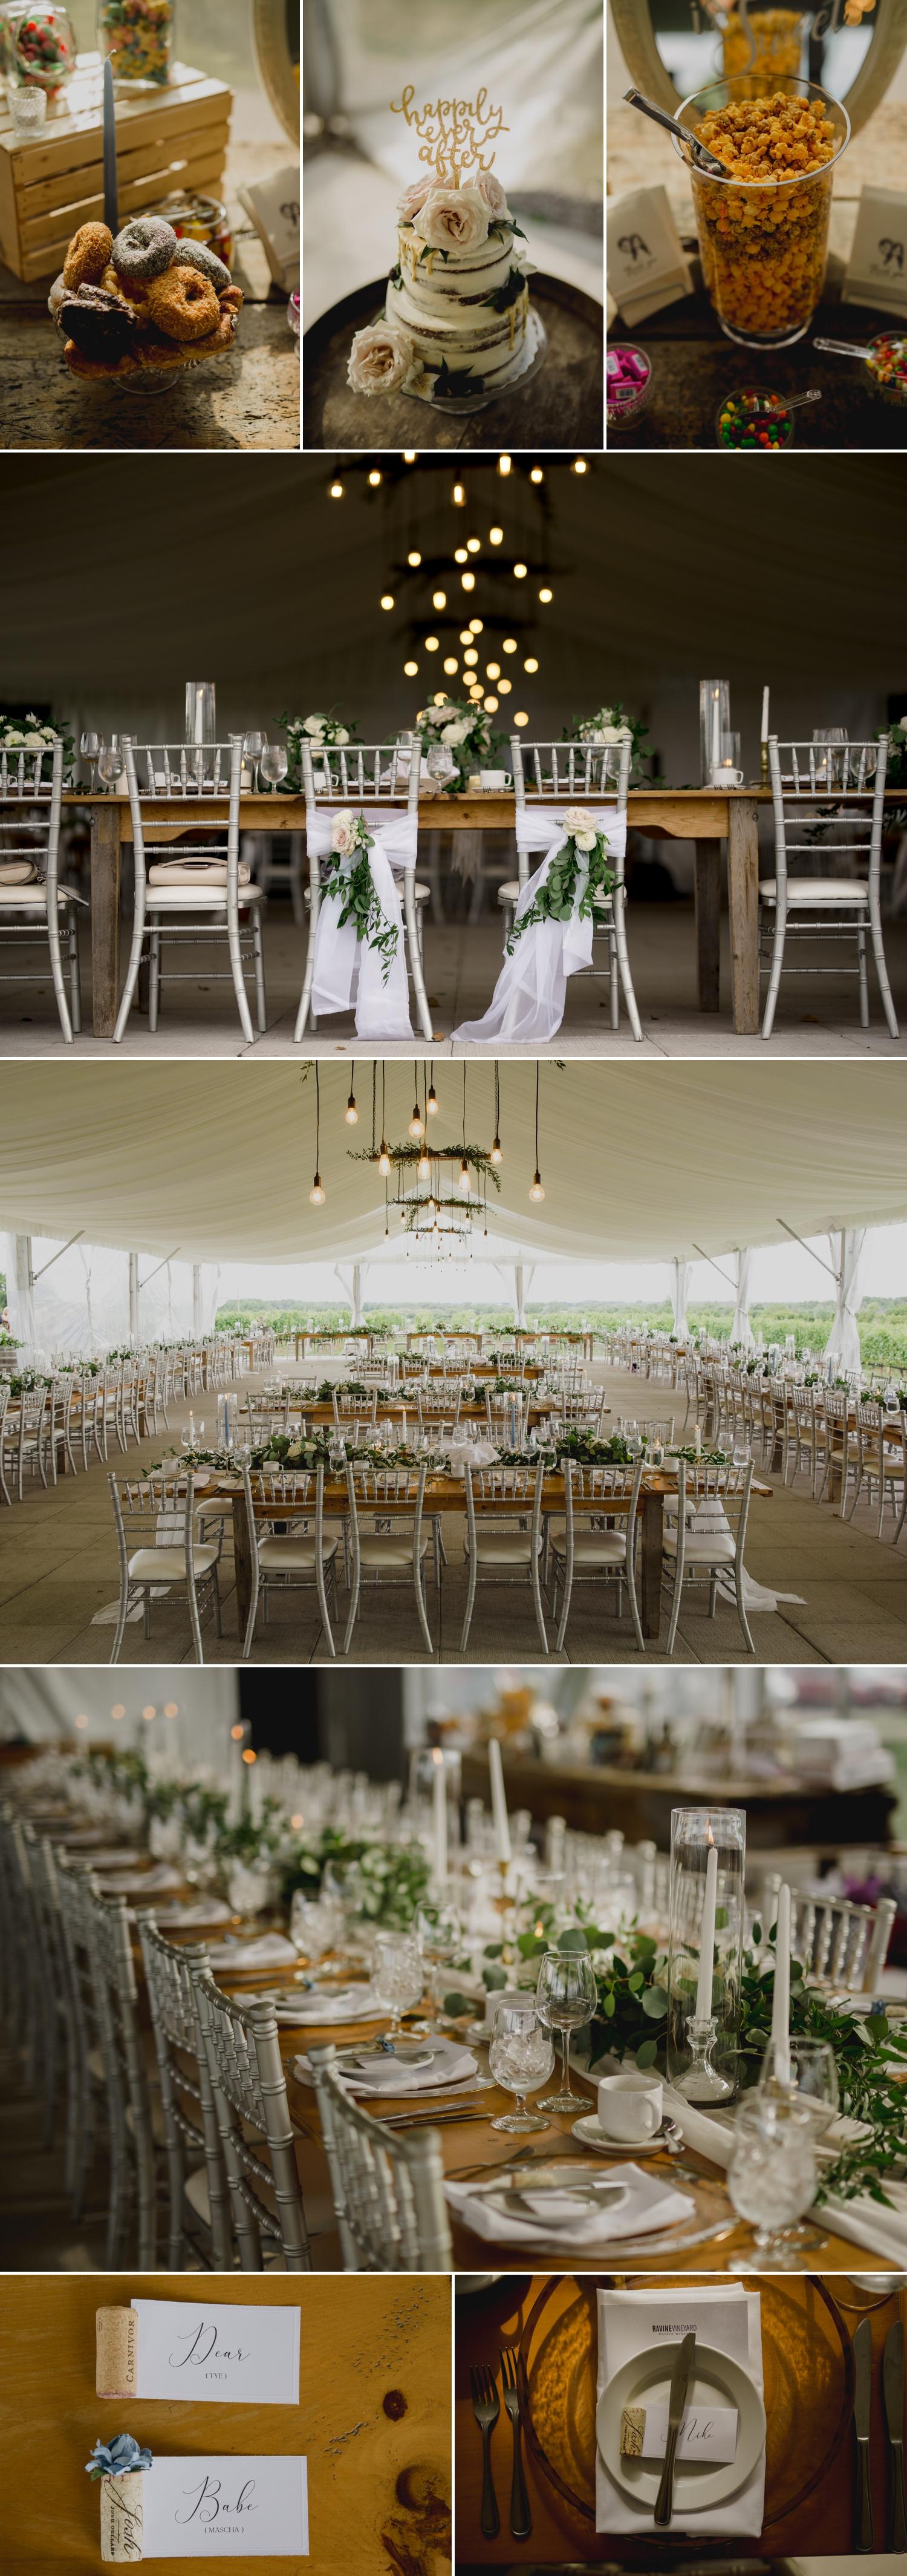 photos of the wedding reception decor at the ravine vineyard in niagara on the lake ontario